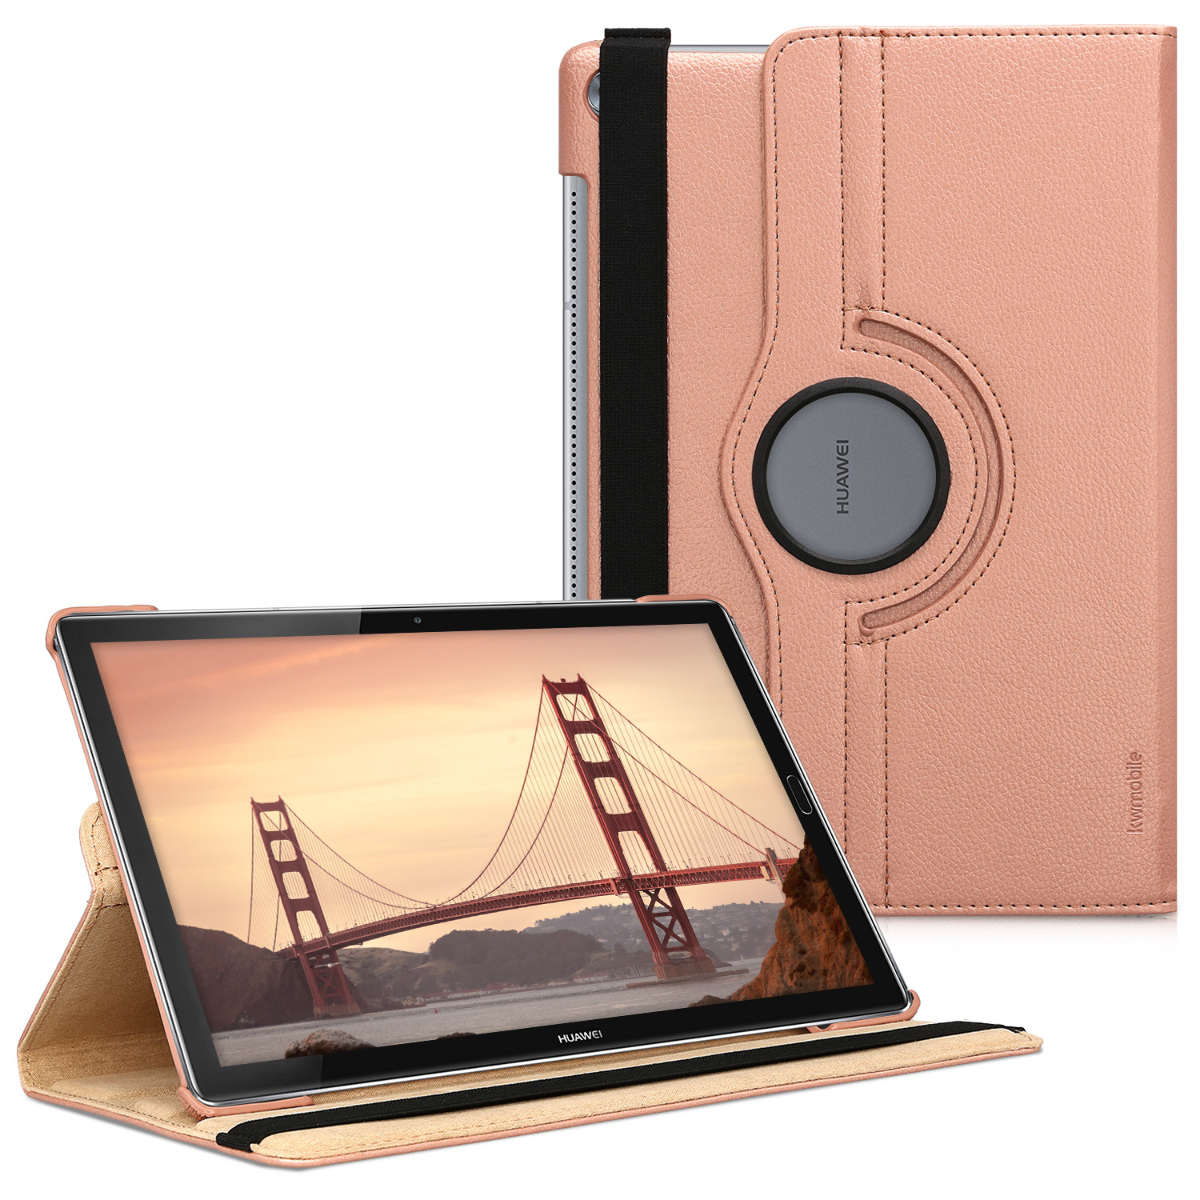 KW Θήκη 360° Huawei MediaPad M5 10.8'' / M5 10 Pro - Rose Gold (44414.81)